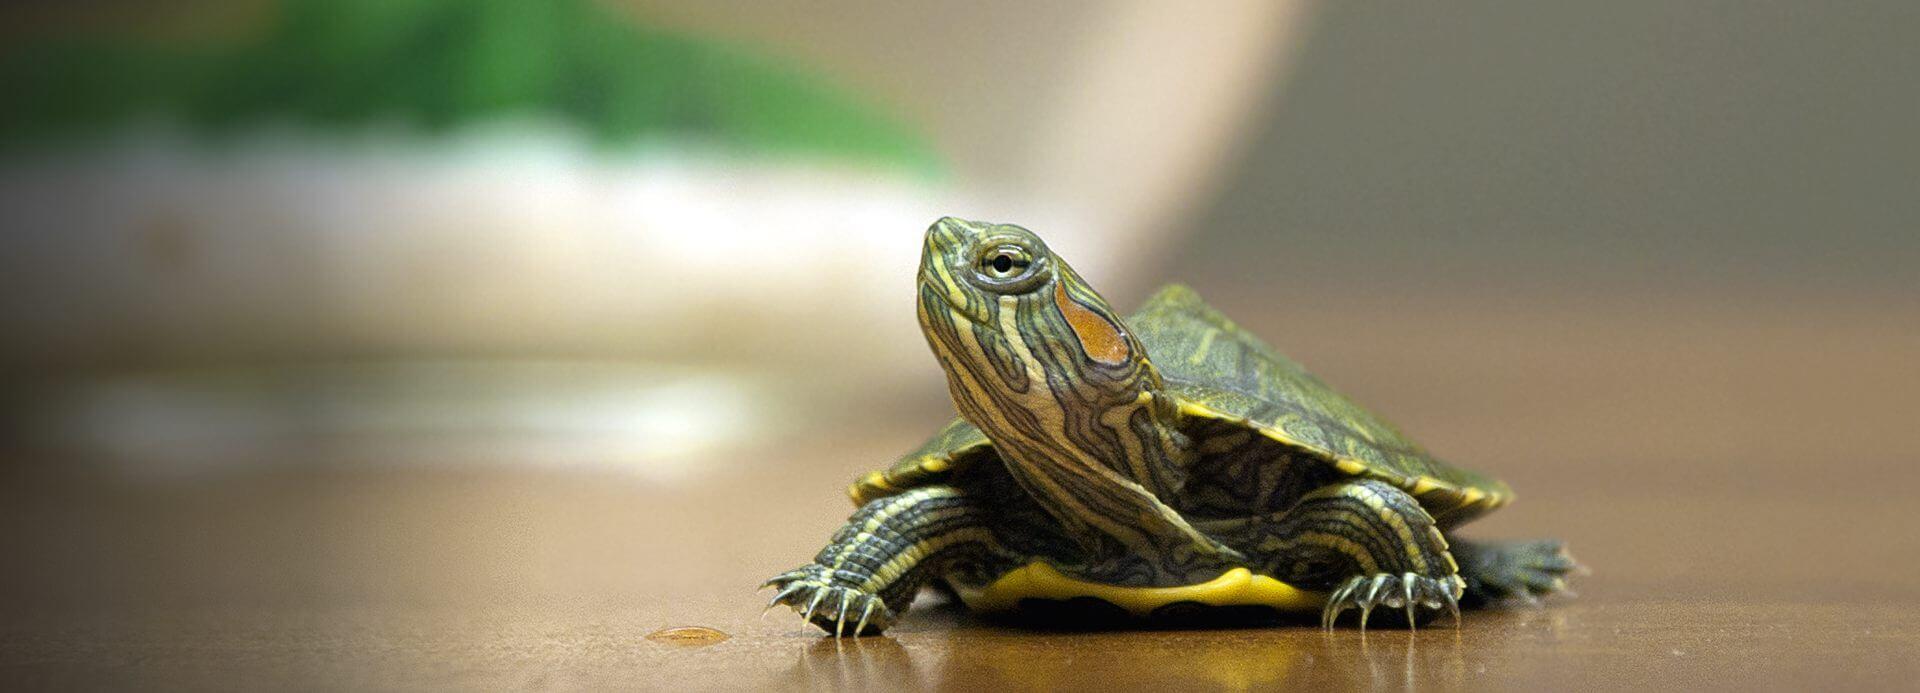 Amazon Com Reptiles Amp Amphibians Pet Supplies Food